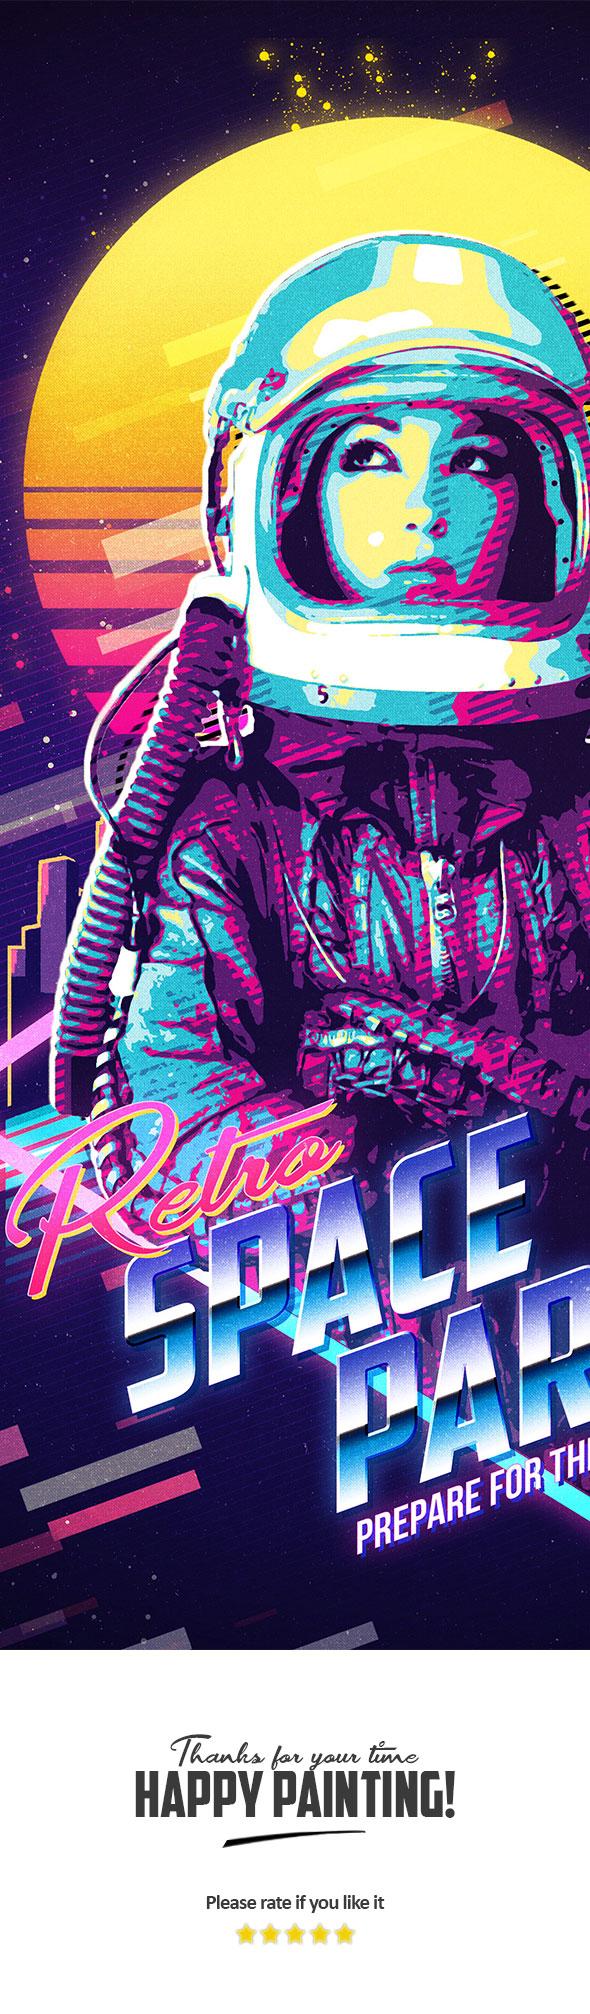 80s retro poster preview 4